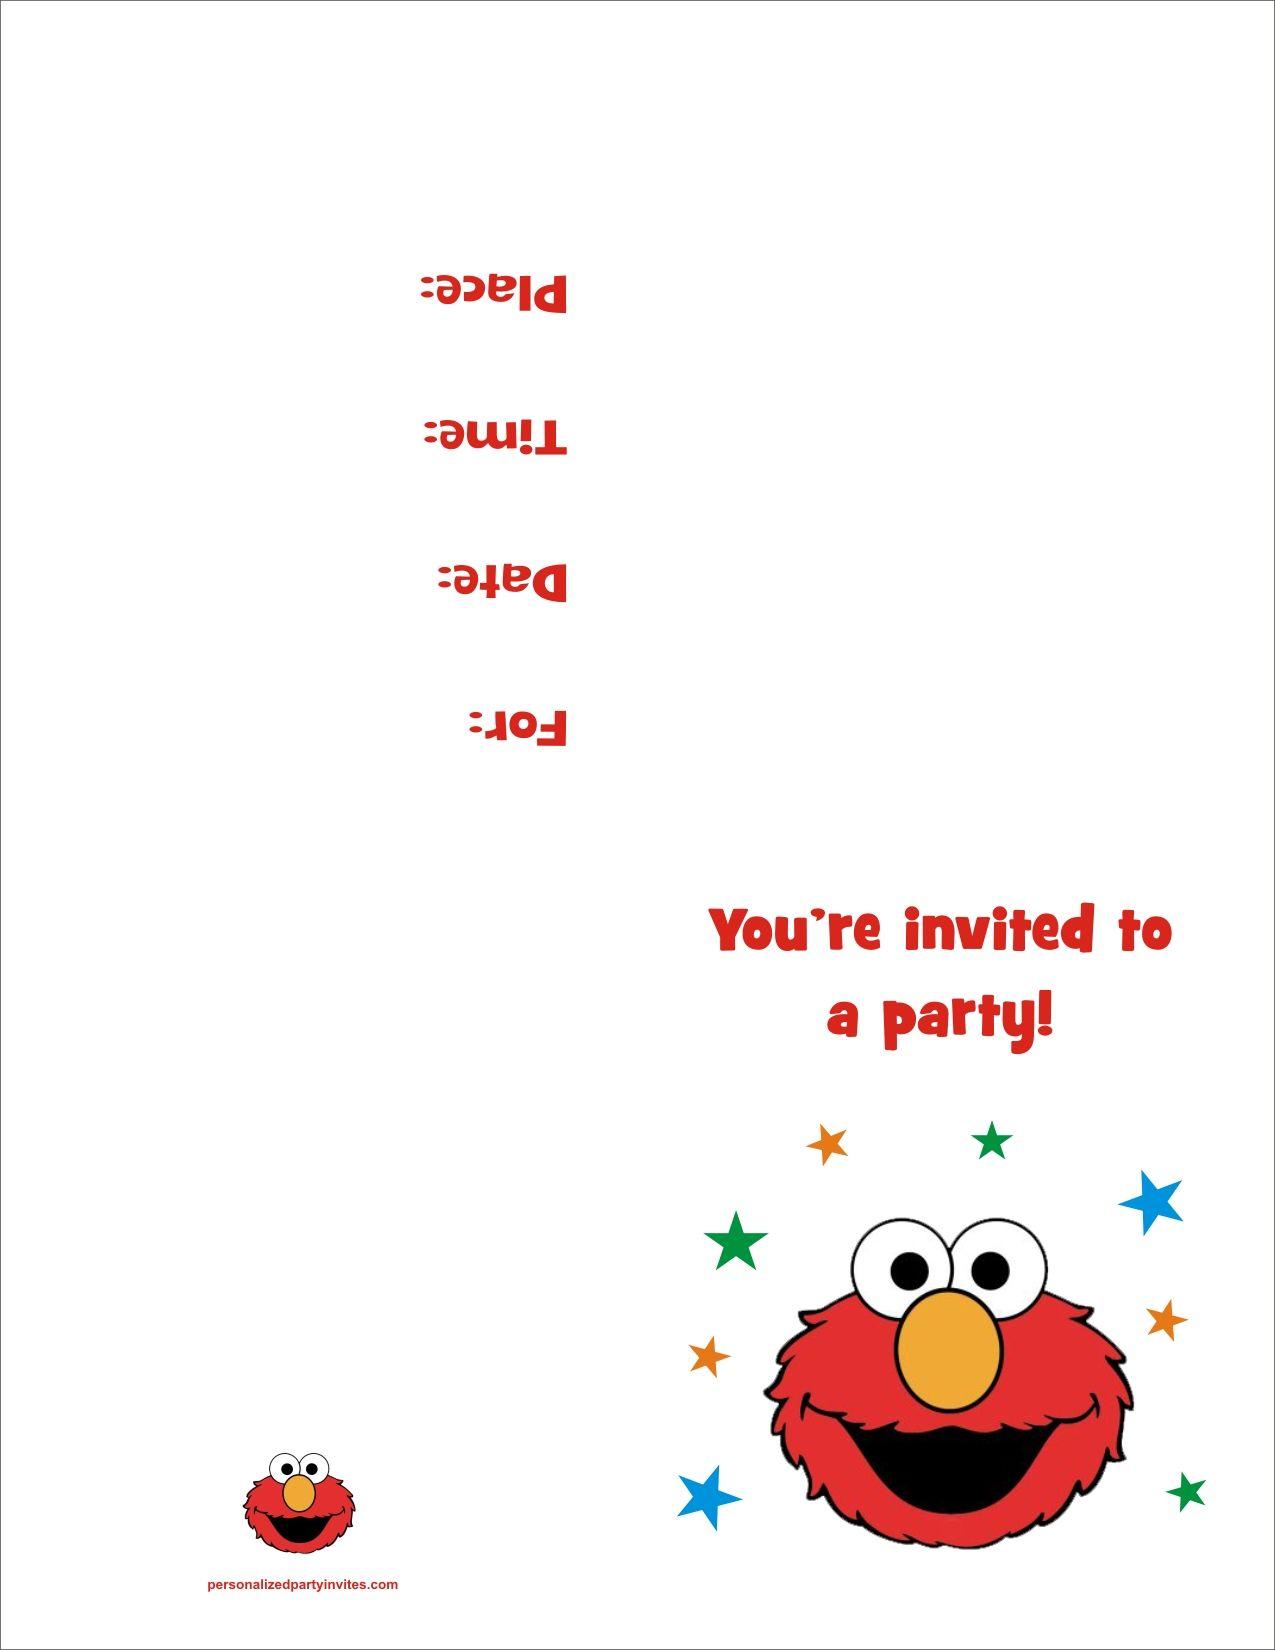 Free Printables Elmo FREE Printable Birthday Party Invitation - Free printable elmo birthday invitations template